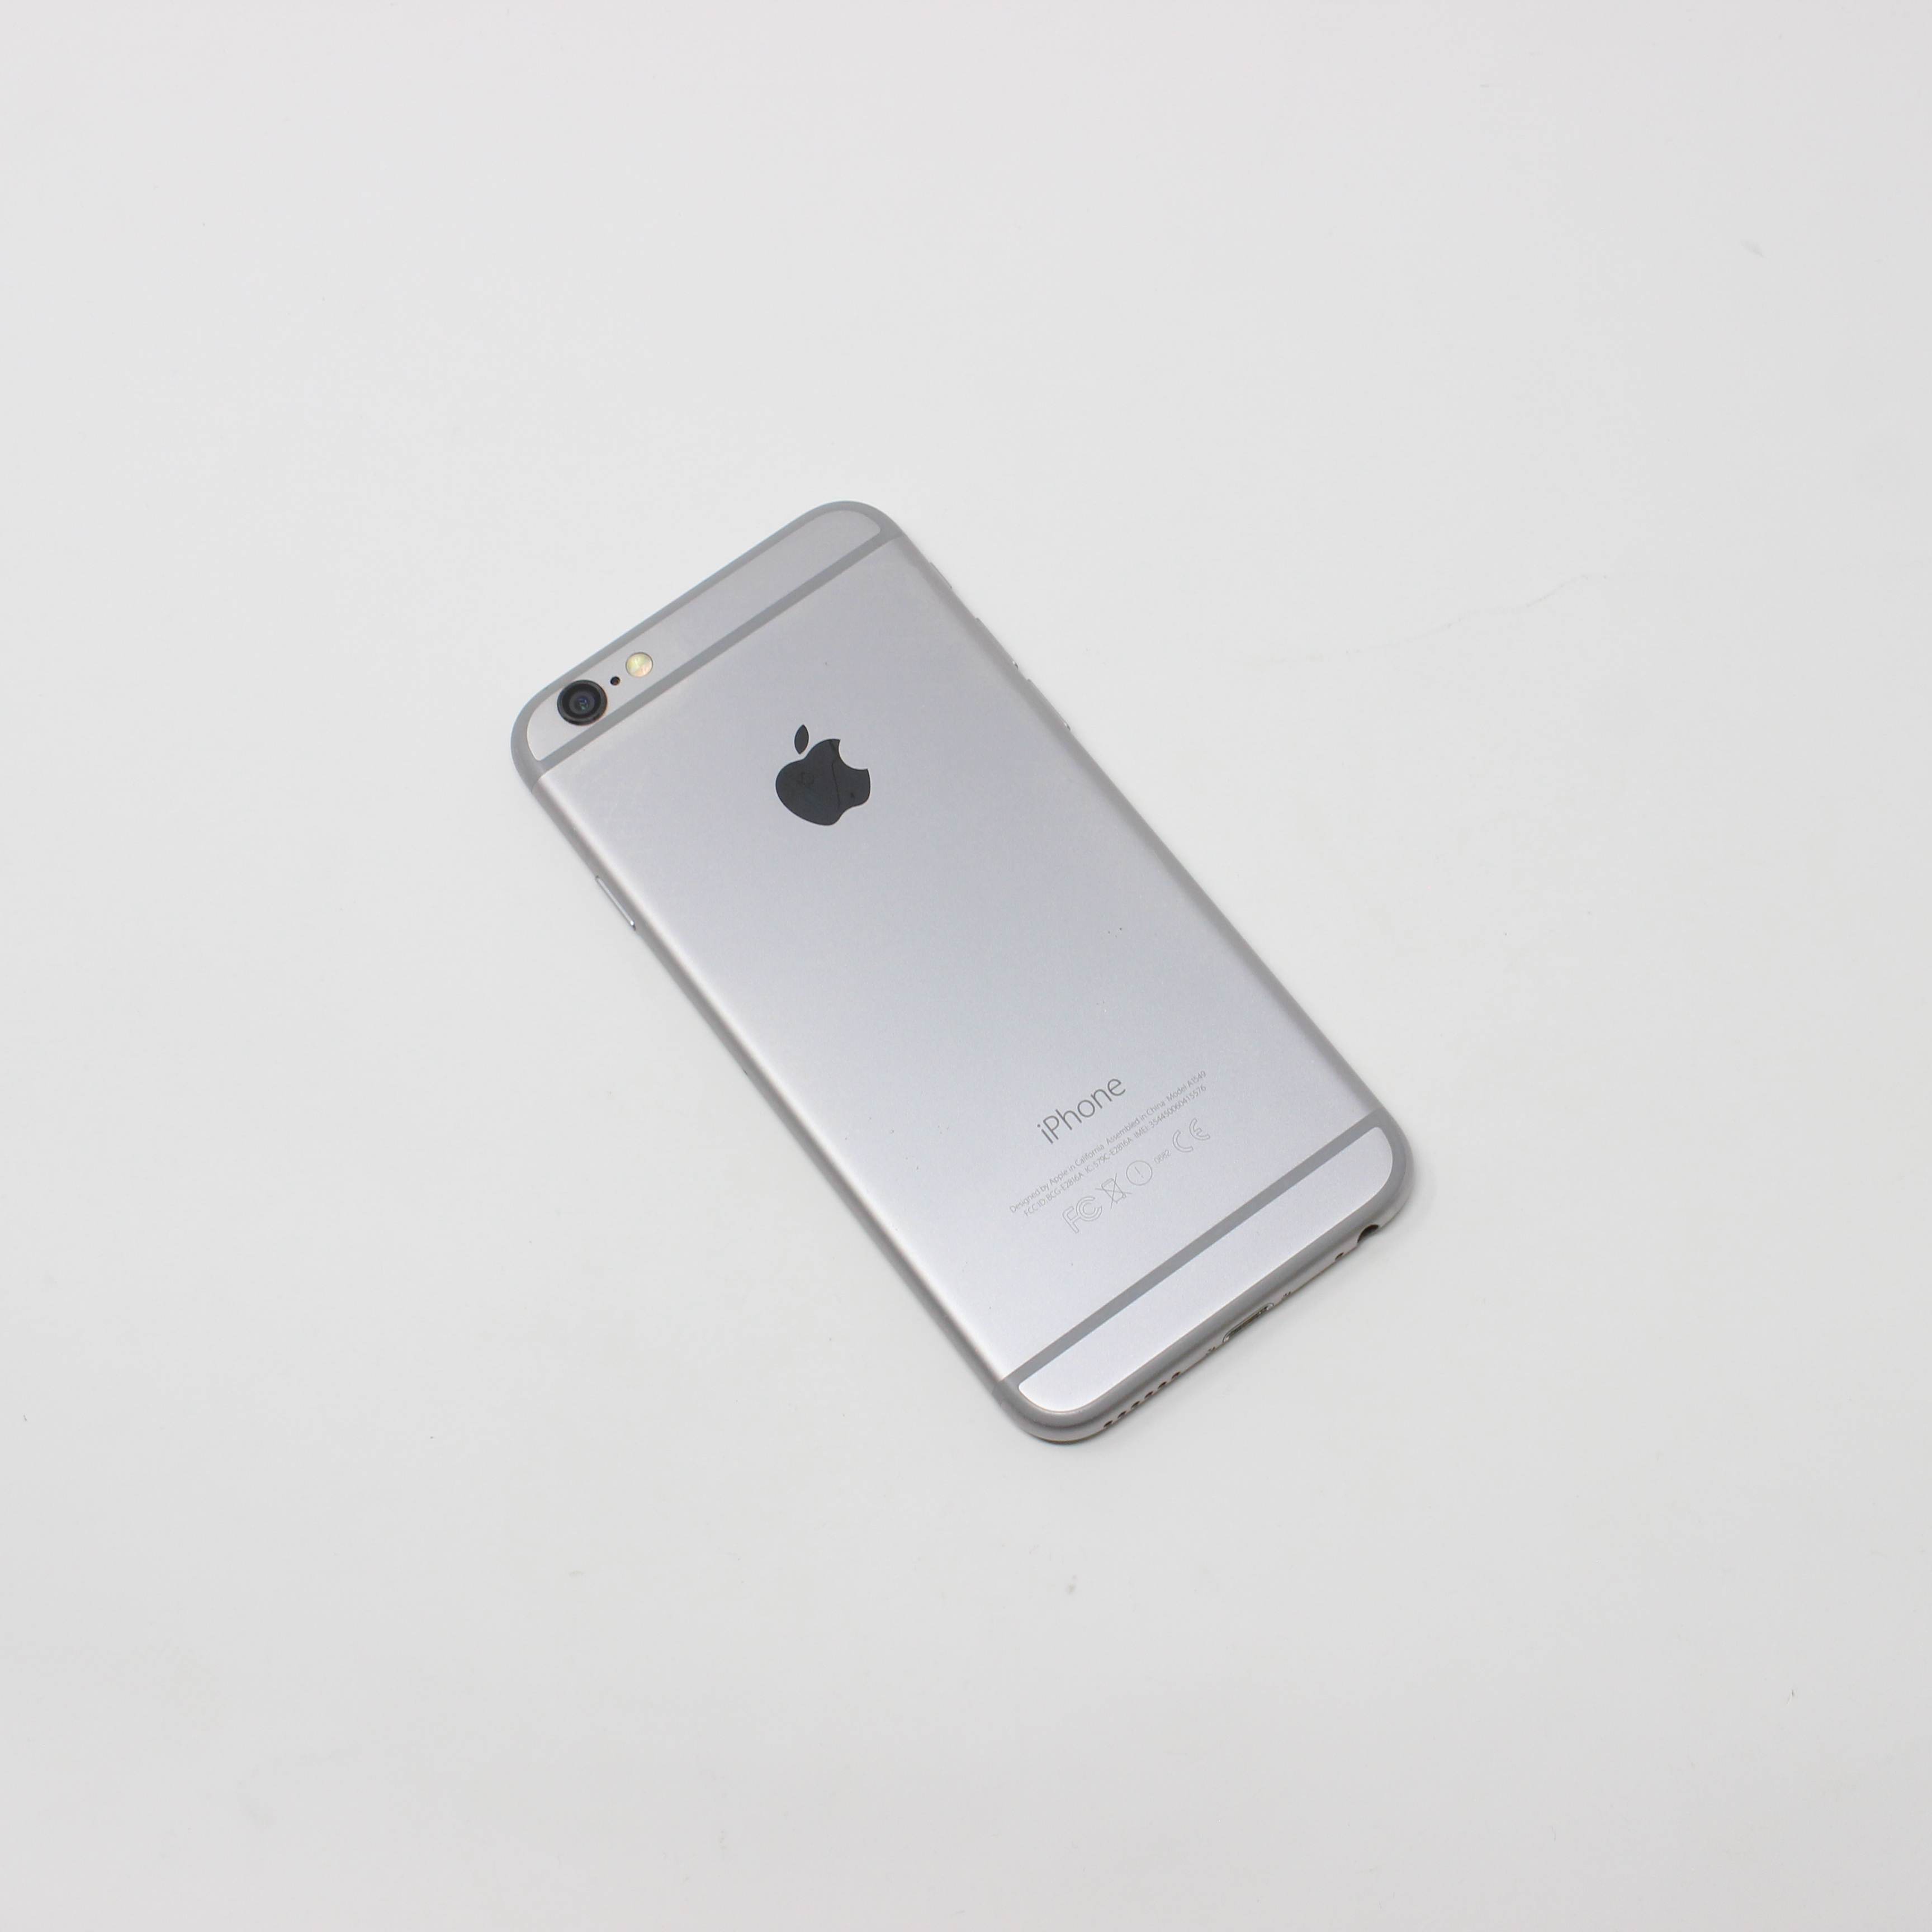 iPhone 6 64GB Space Gray - T-Mobile photo 3 | UpTradeit.com